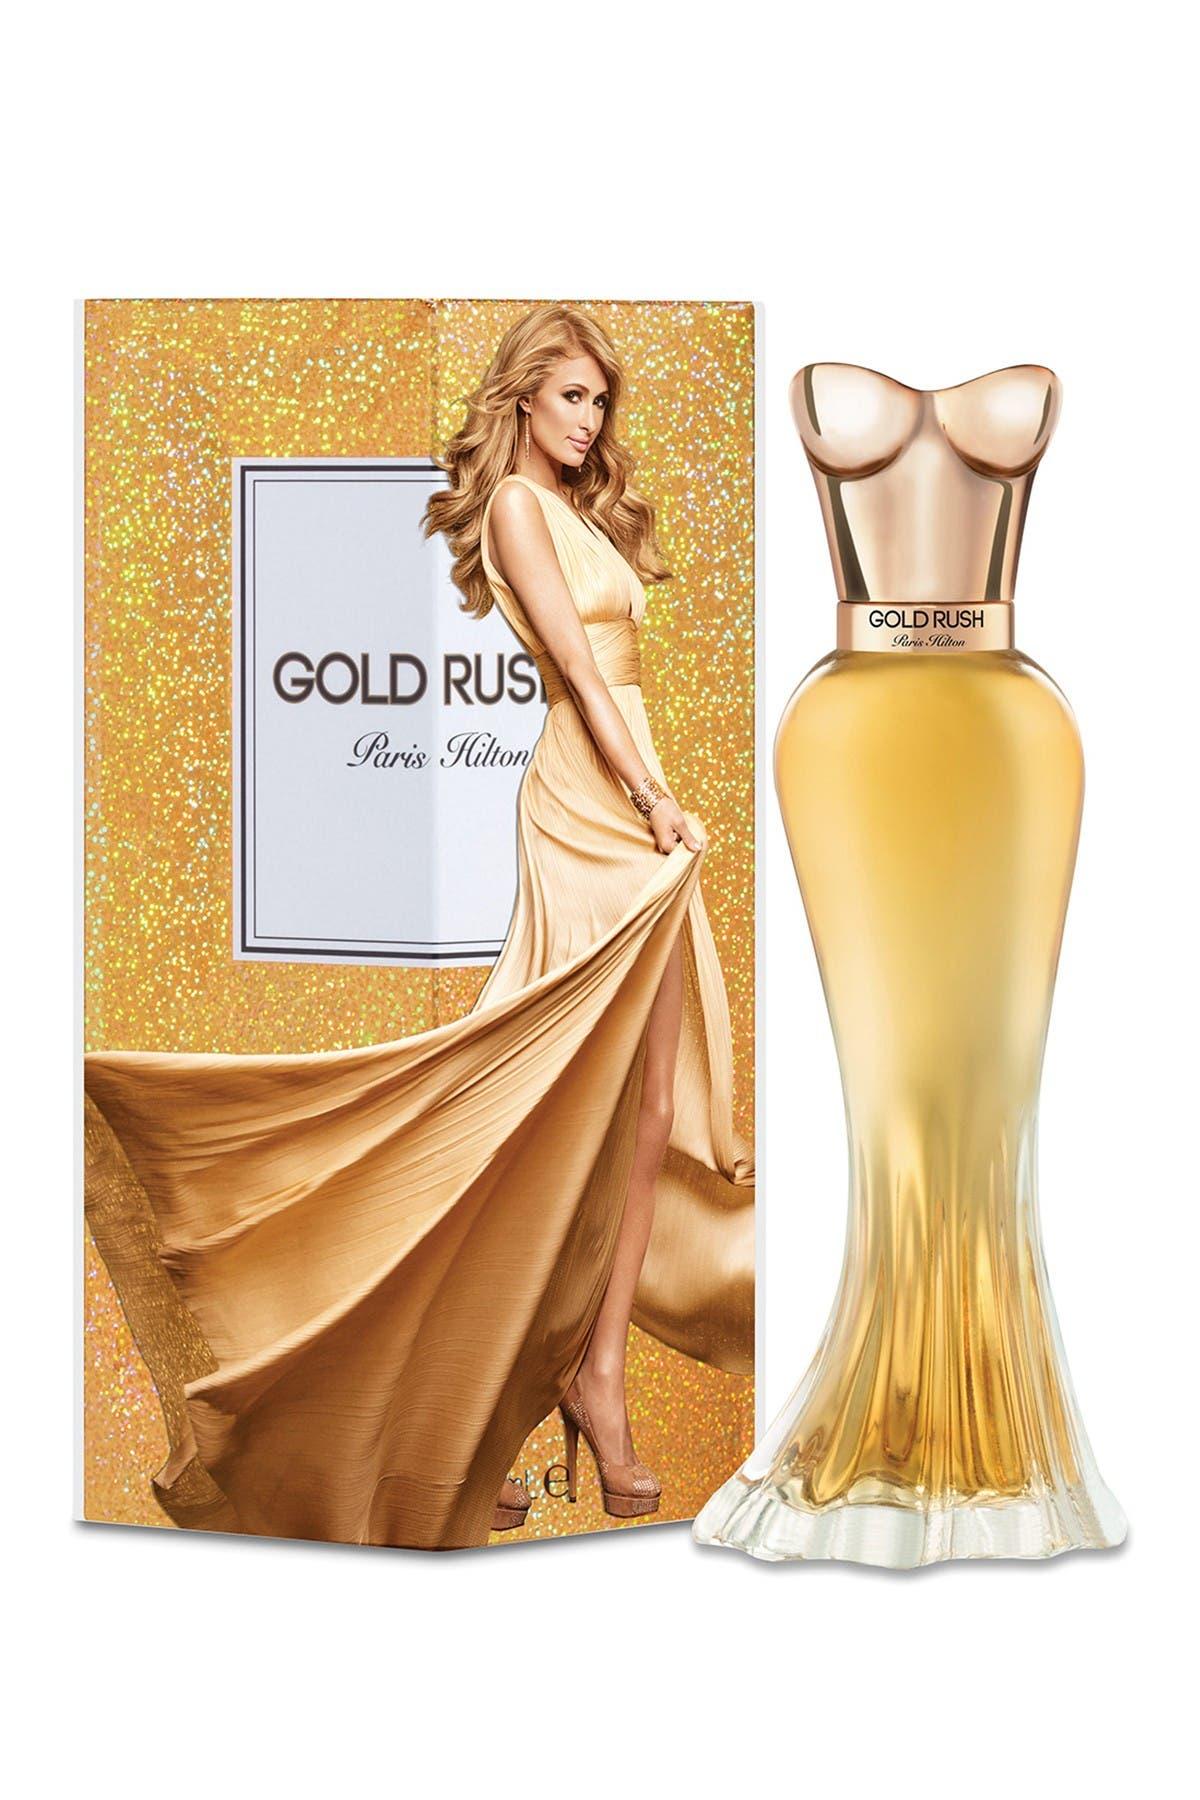 Image of Paris Hilton Gold Rush Eau de Parfum Spray - 3.4 fl. oz.